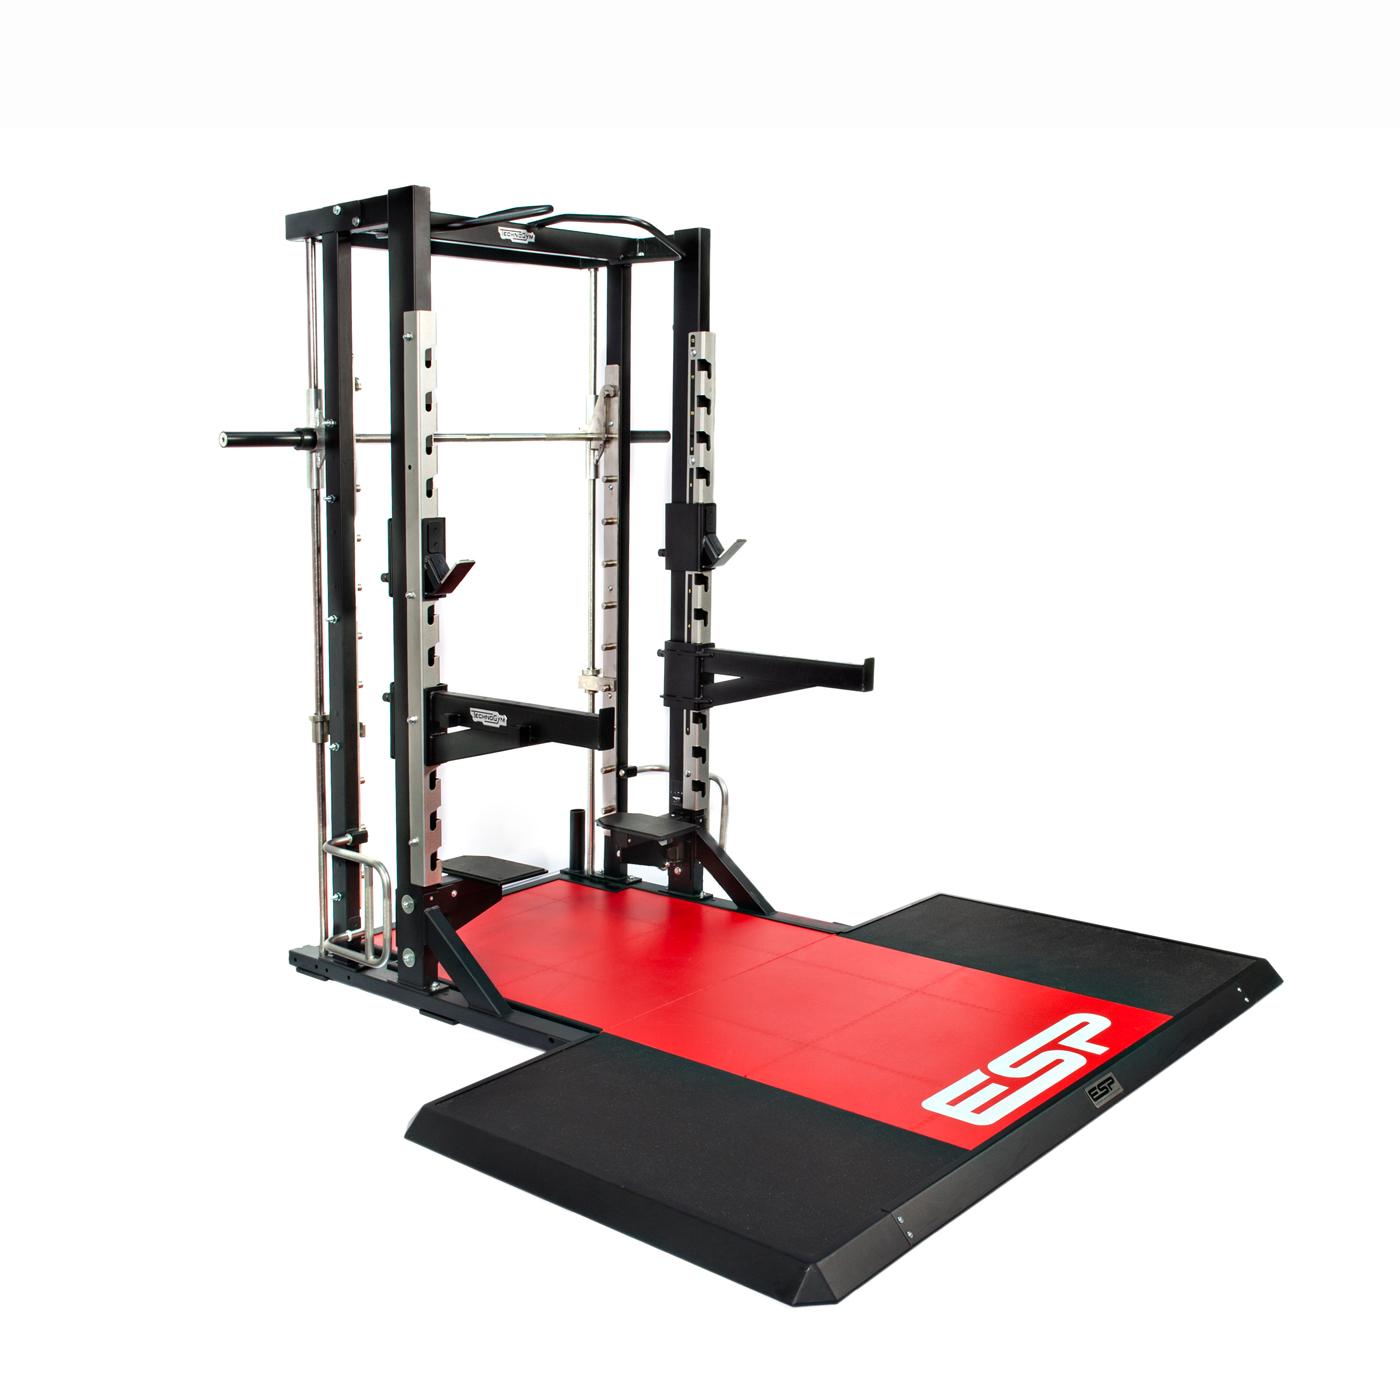 Lifting Platform For Technogym Half Rack Esp Fitness